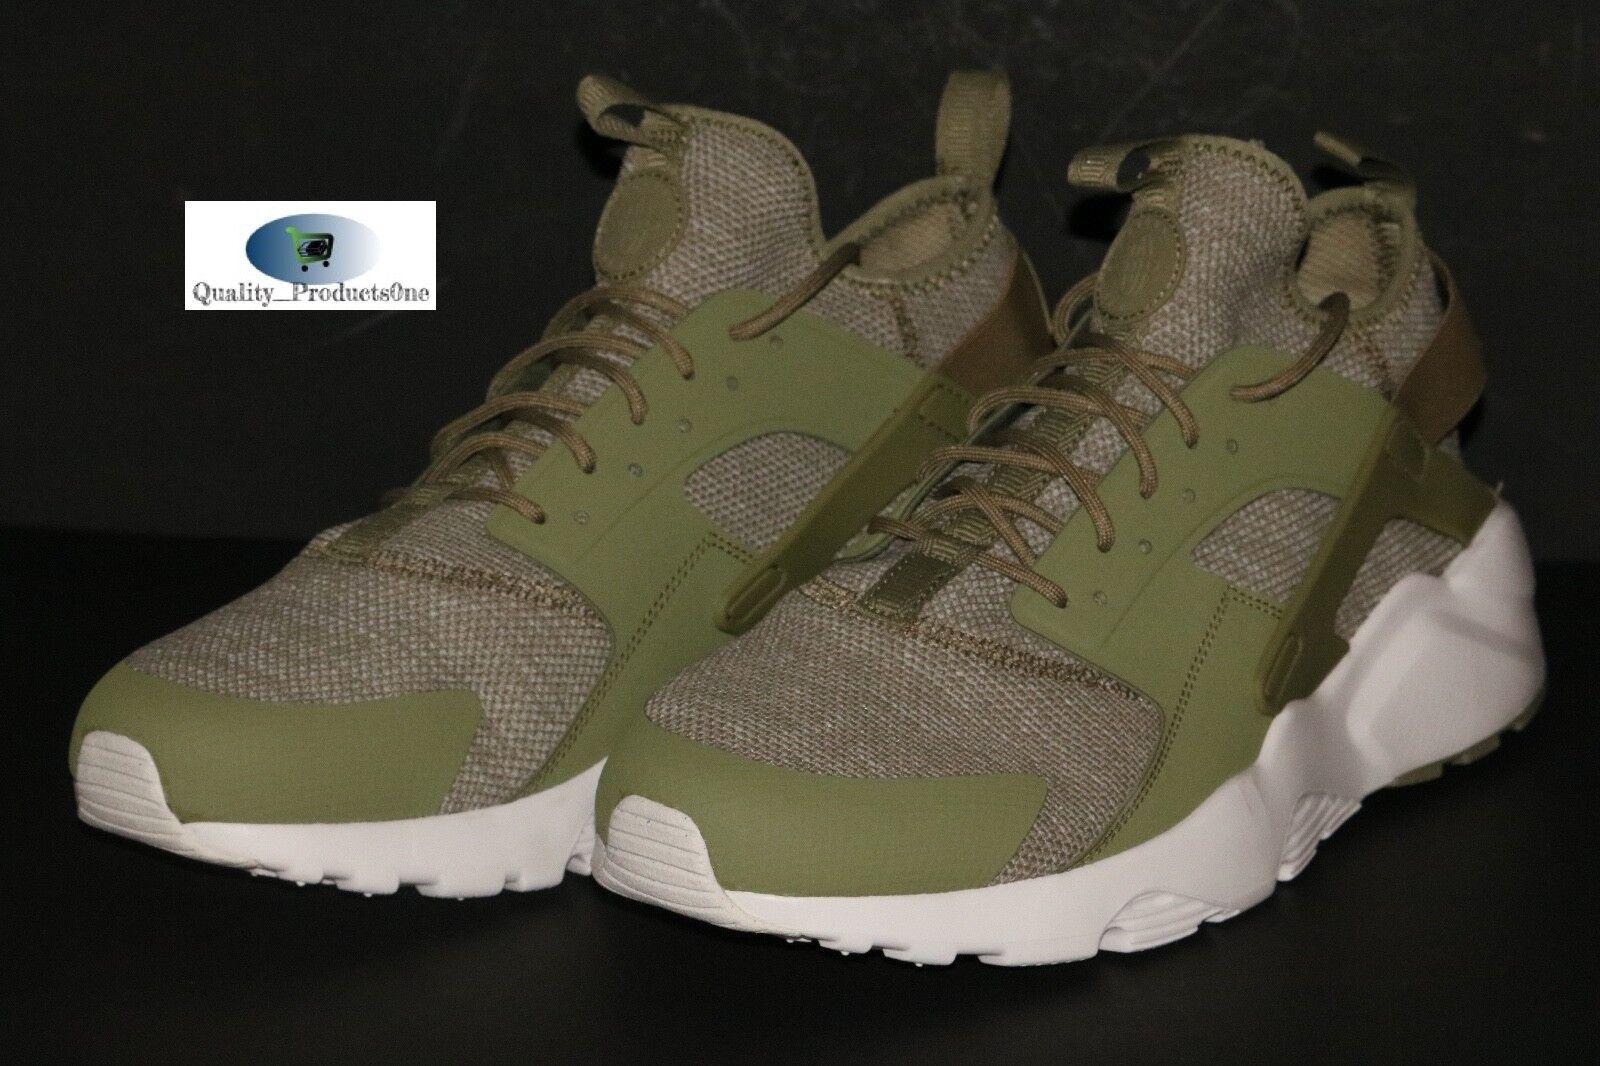 b6128ae487d1 Nike Air Huarache Run Ultra BR Men Lifestyle SNEAKERS Trooper 833147 ...